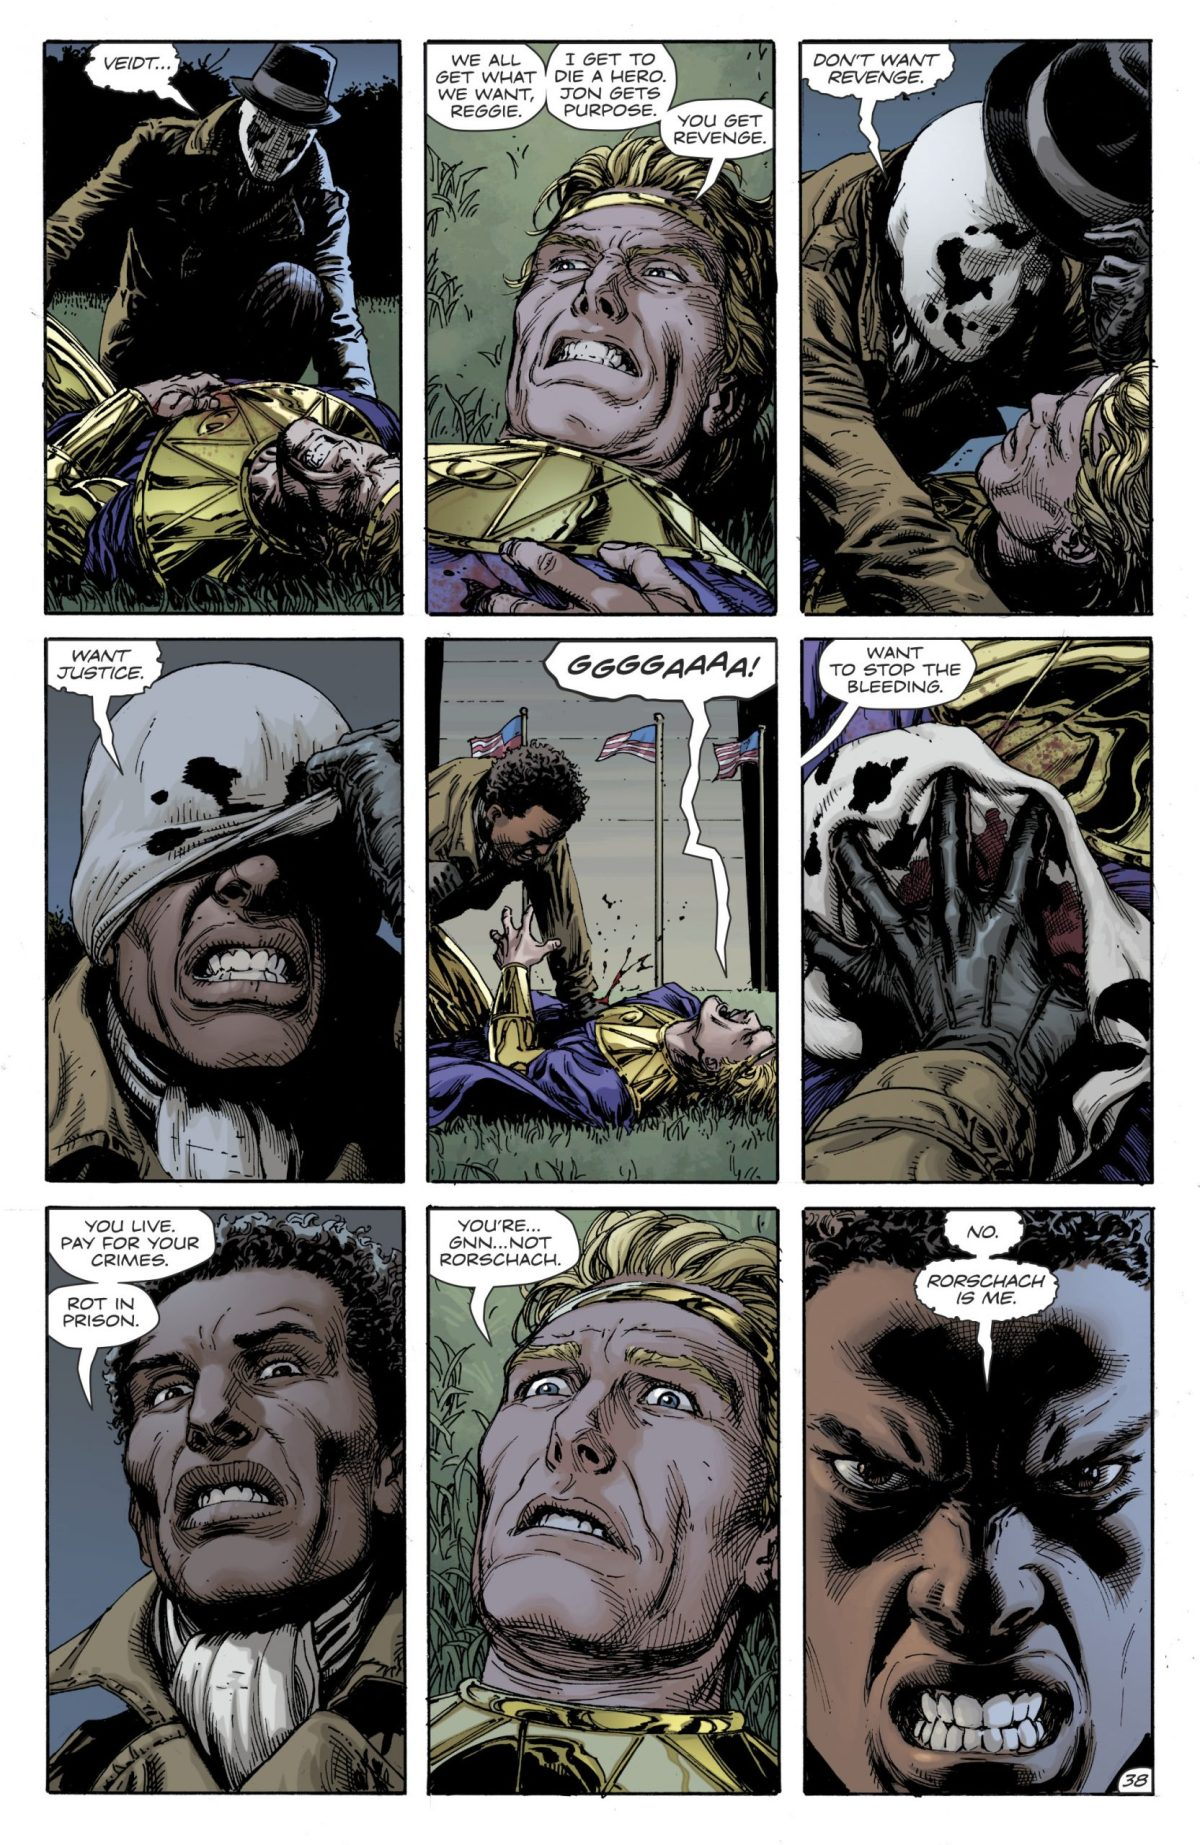 Doomsday Clock #12, Page #38, Rorshach holds down Ozymandias